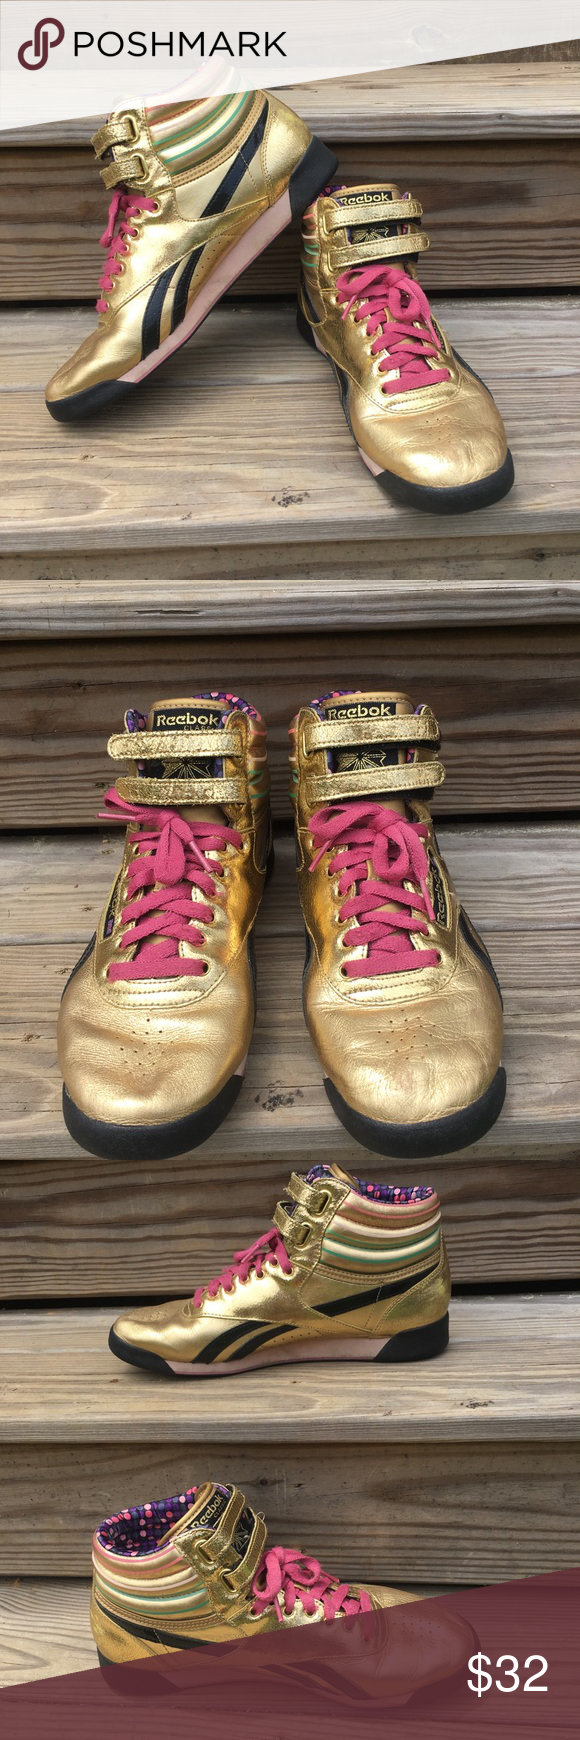 Reebok Classics Gold Metallic High Top